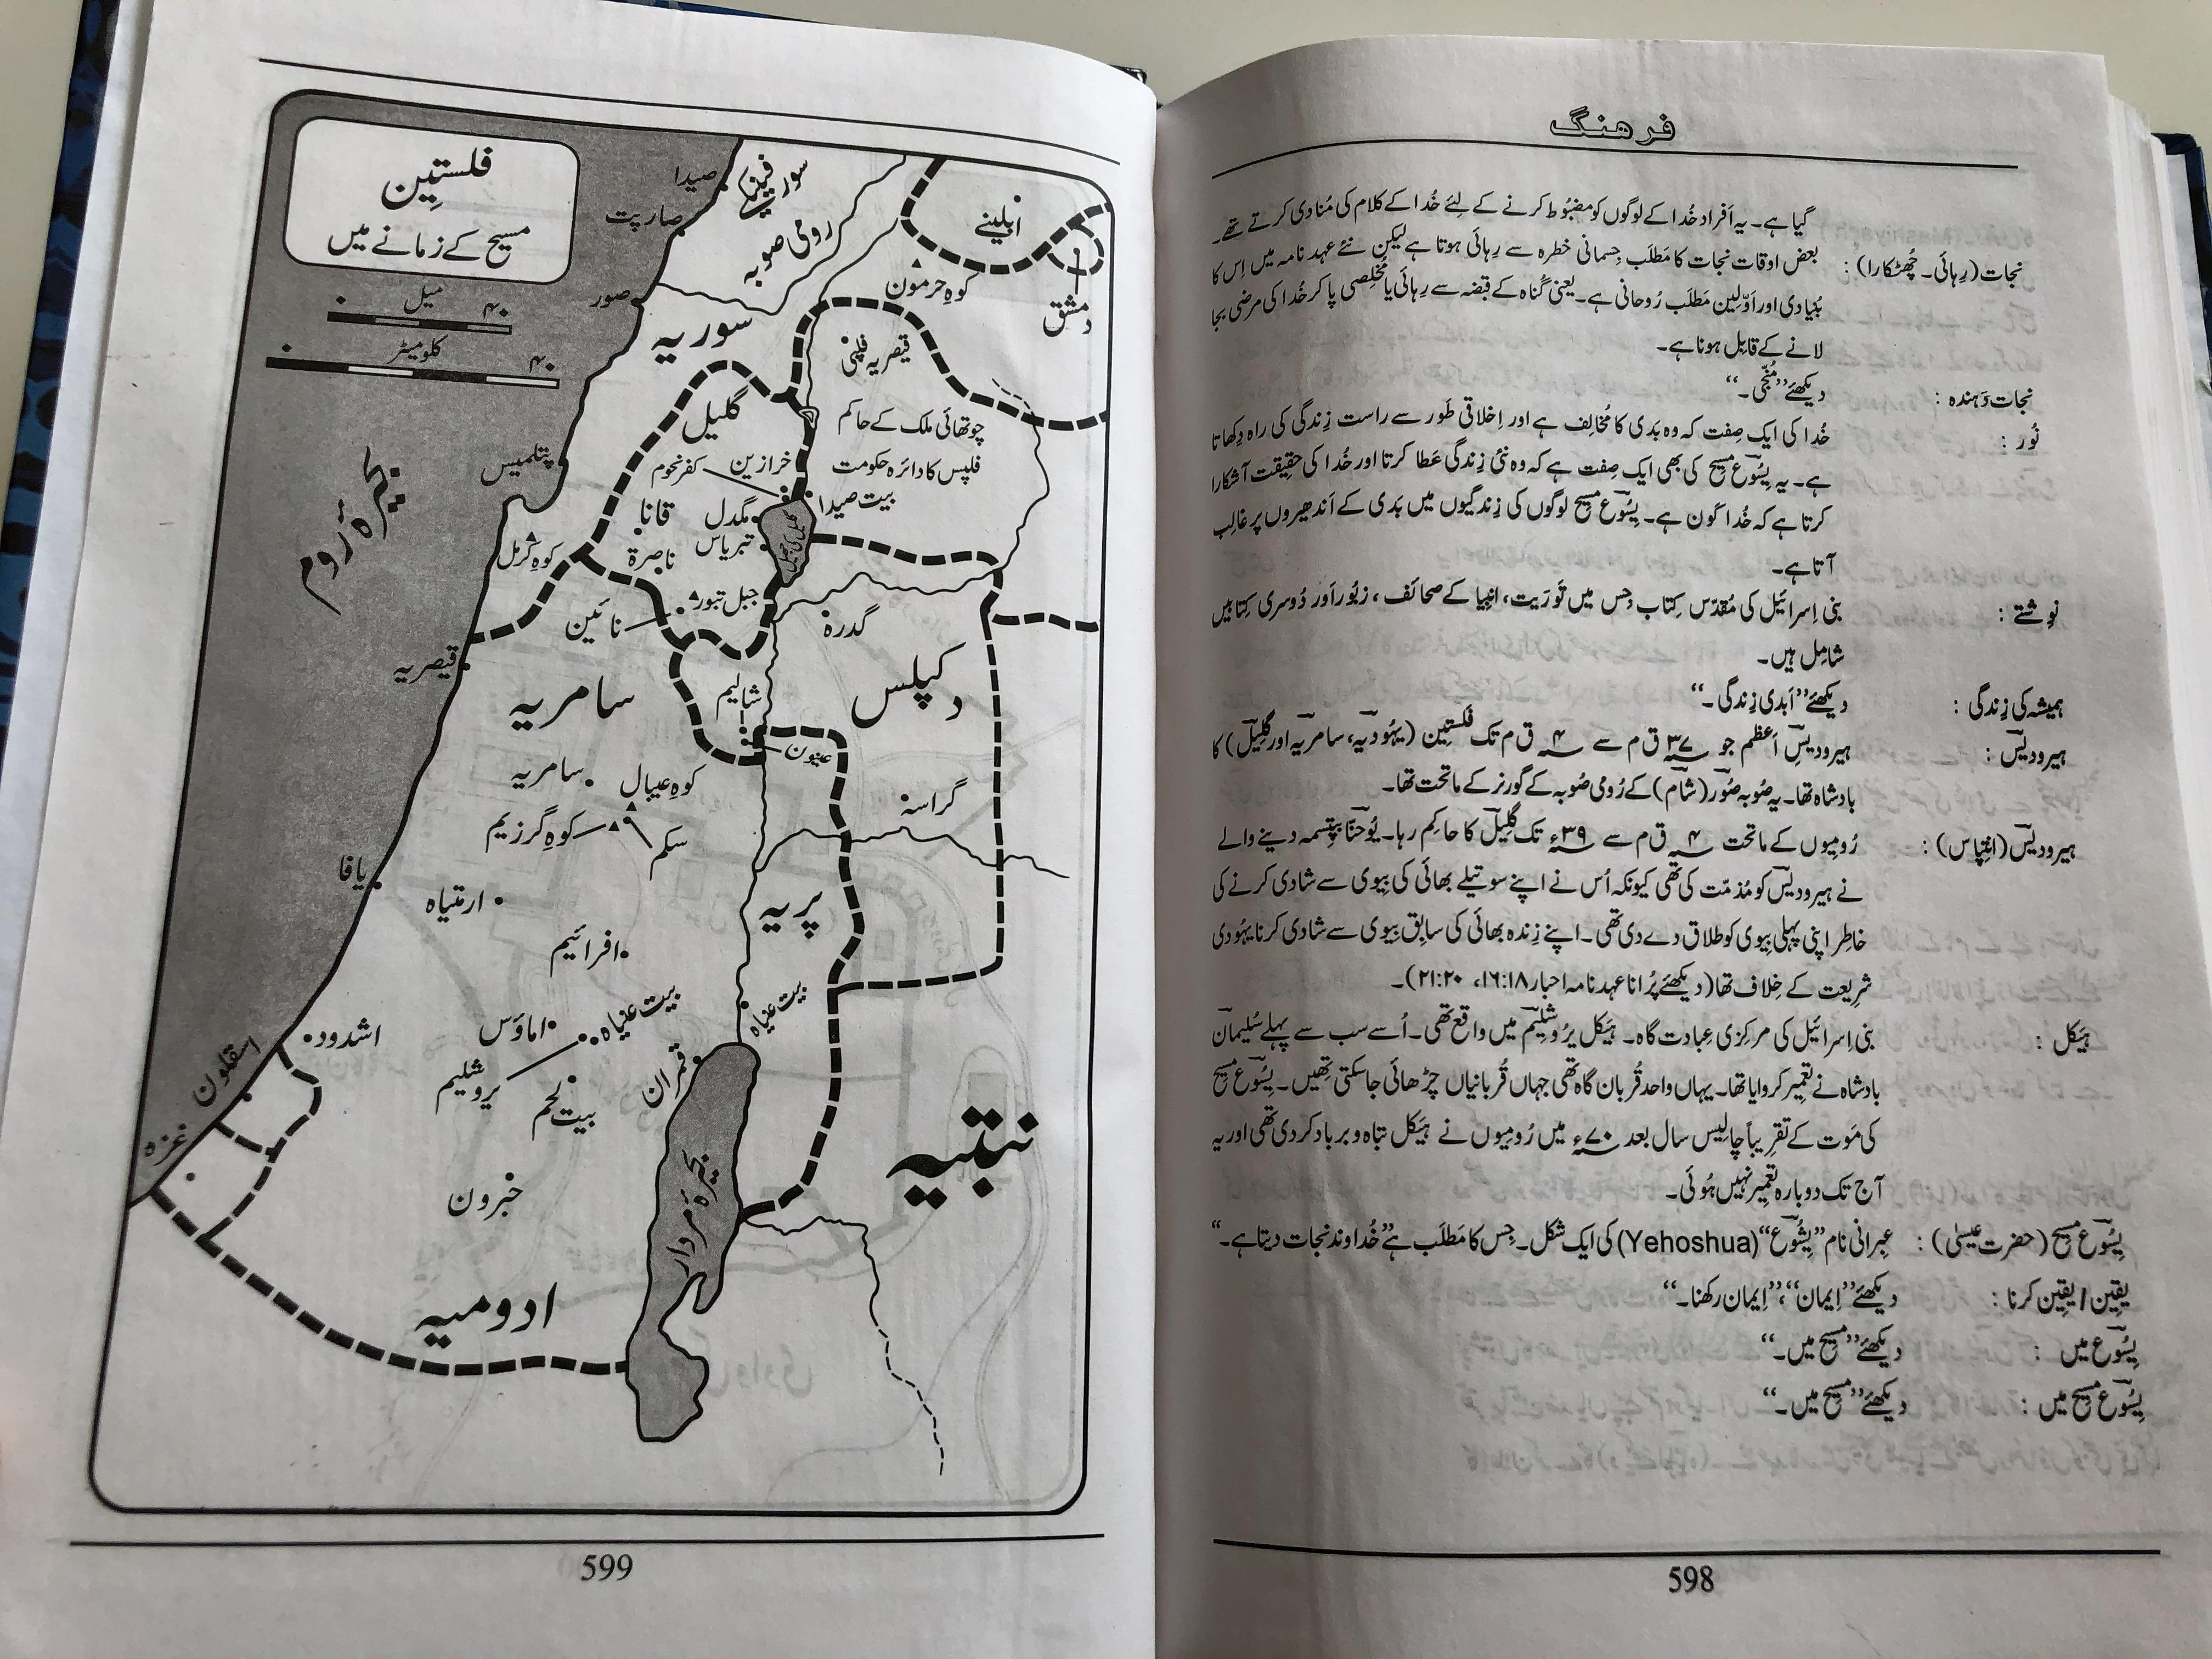 english-urdu-diaglot-bilingual-new-testament-10-.jpg